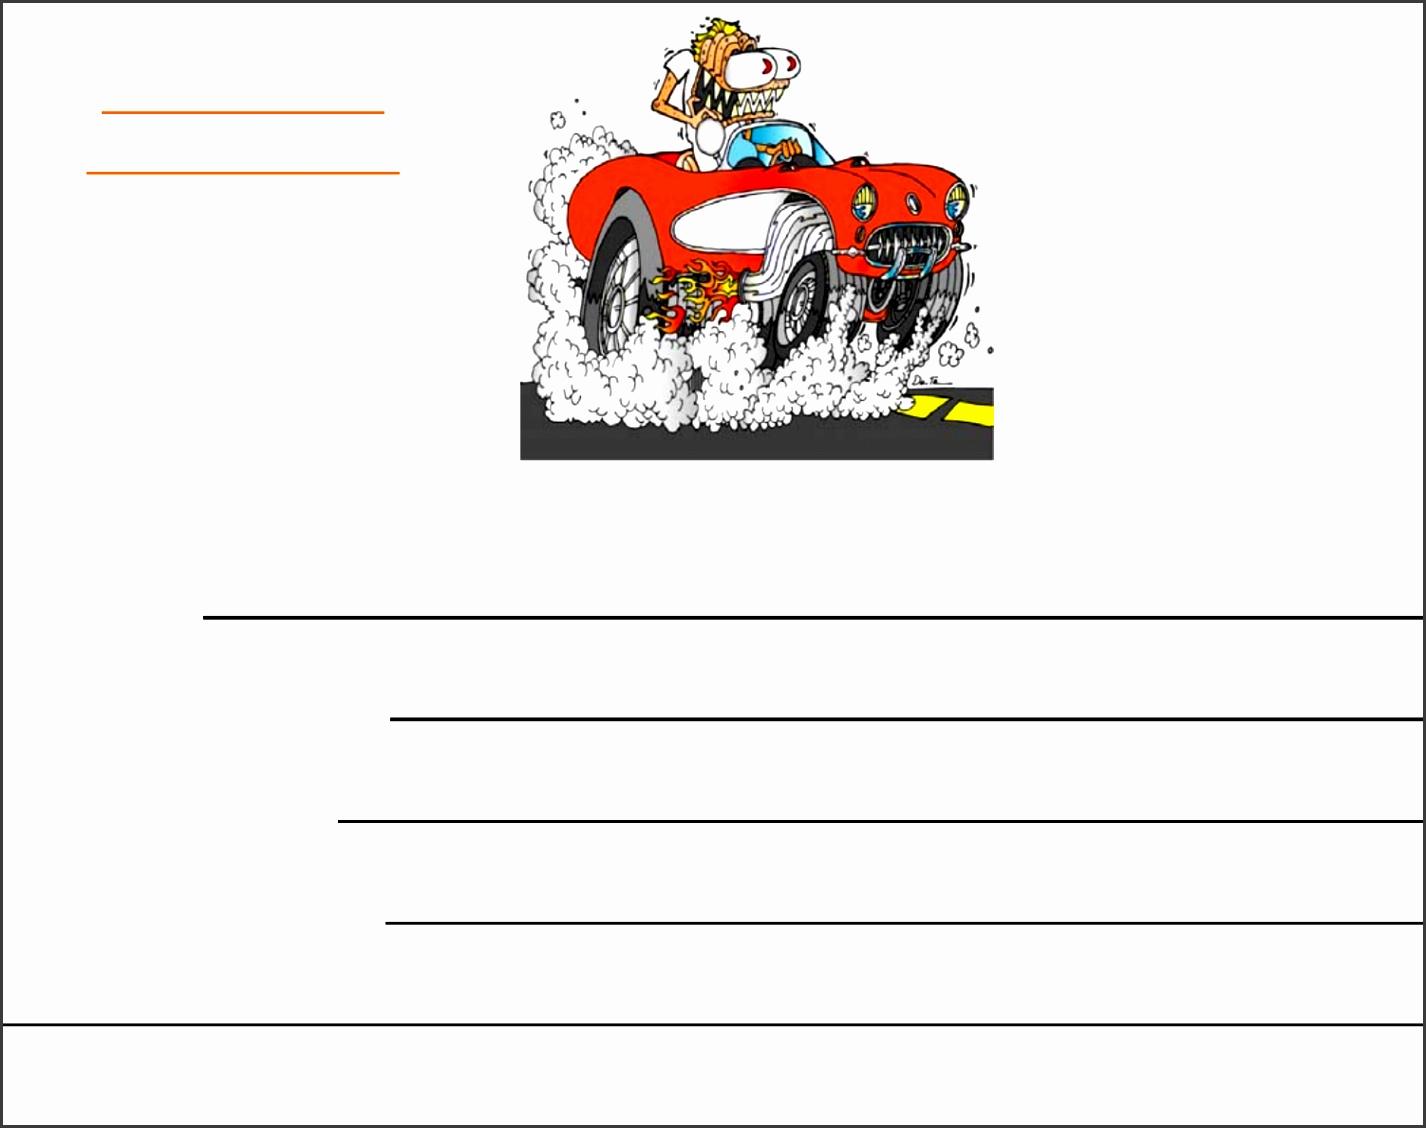 Registration Form Template Free Download SampleTemplatess - Car show registration form template